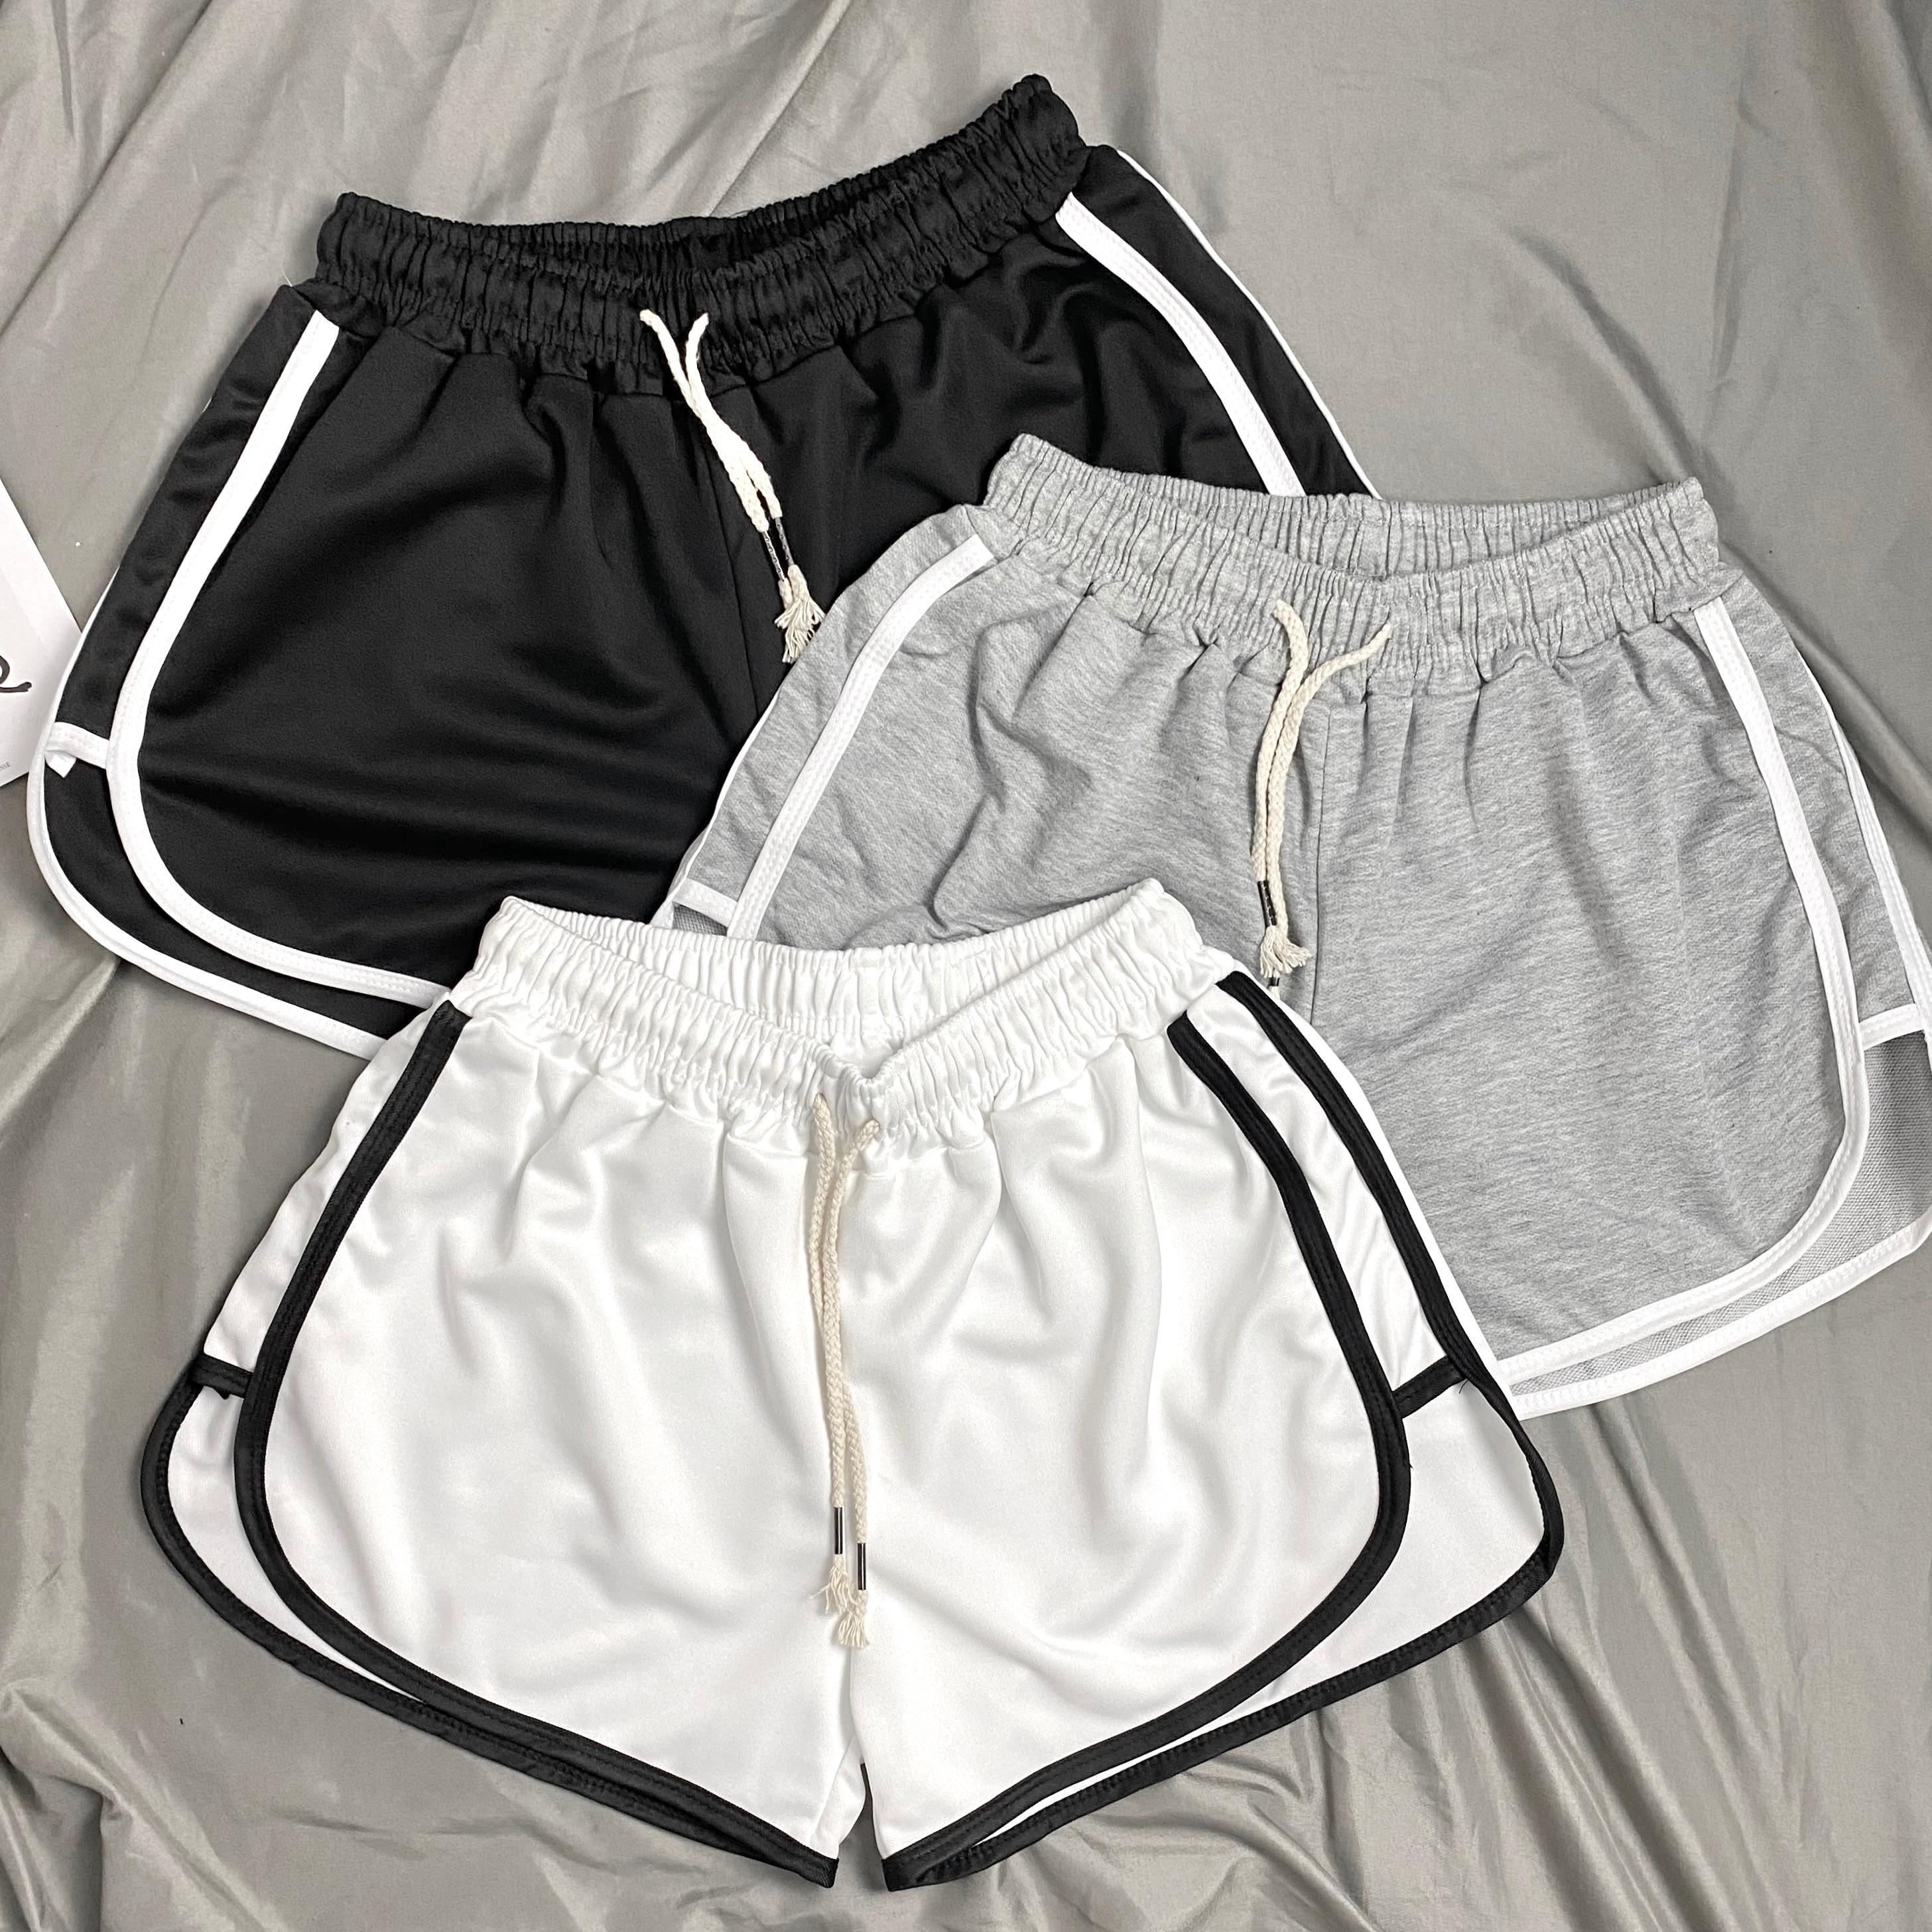 Sports Shorts Women's Summer Ins Trendy New Outdoor Running Loungewear Pajama Shorts Casual High Wai